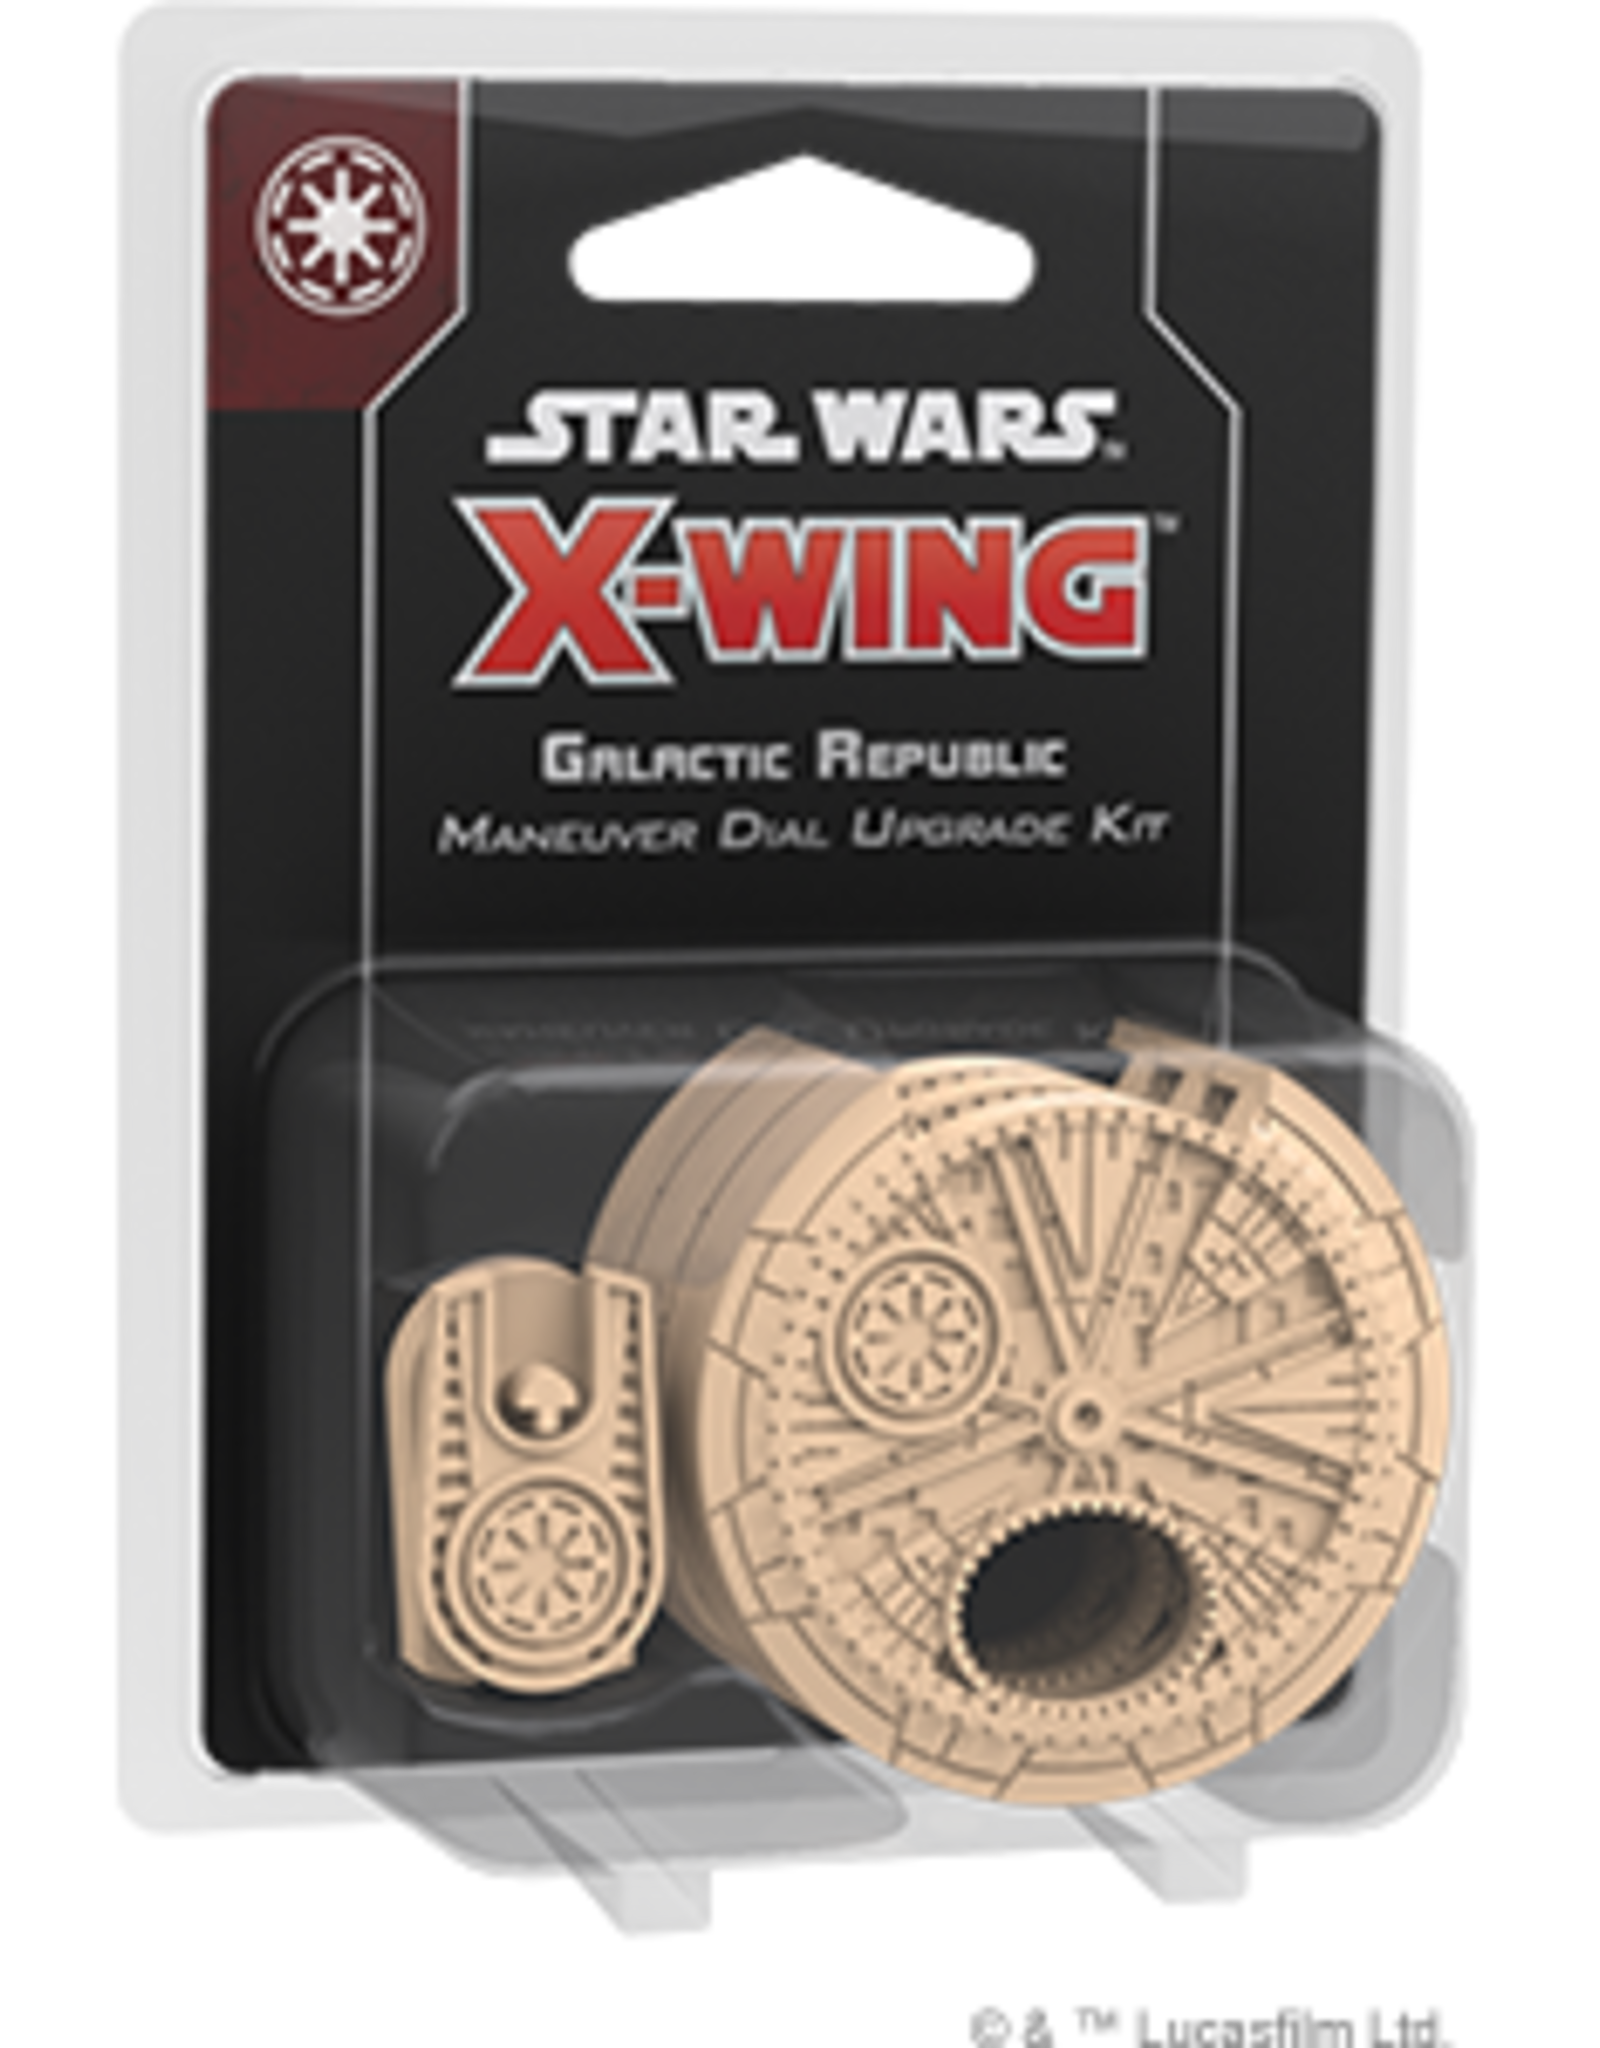 FFG Star Wars X-Wing 2.0: Galactic Republic Maneuver Dial Upgrade Kit